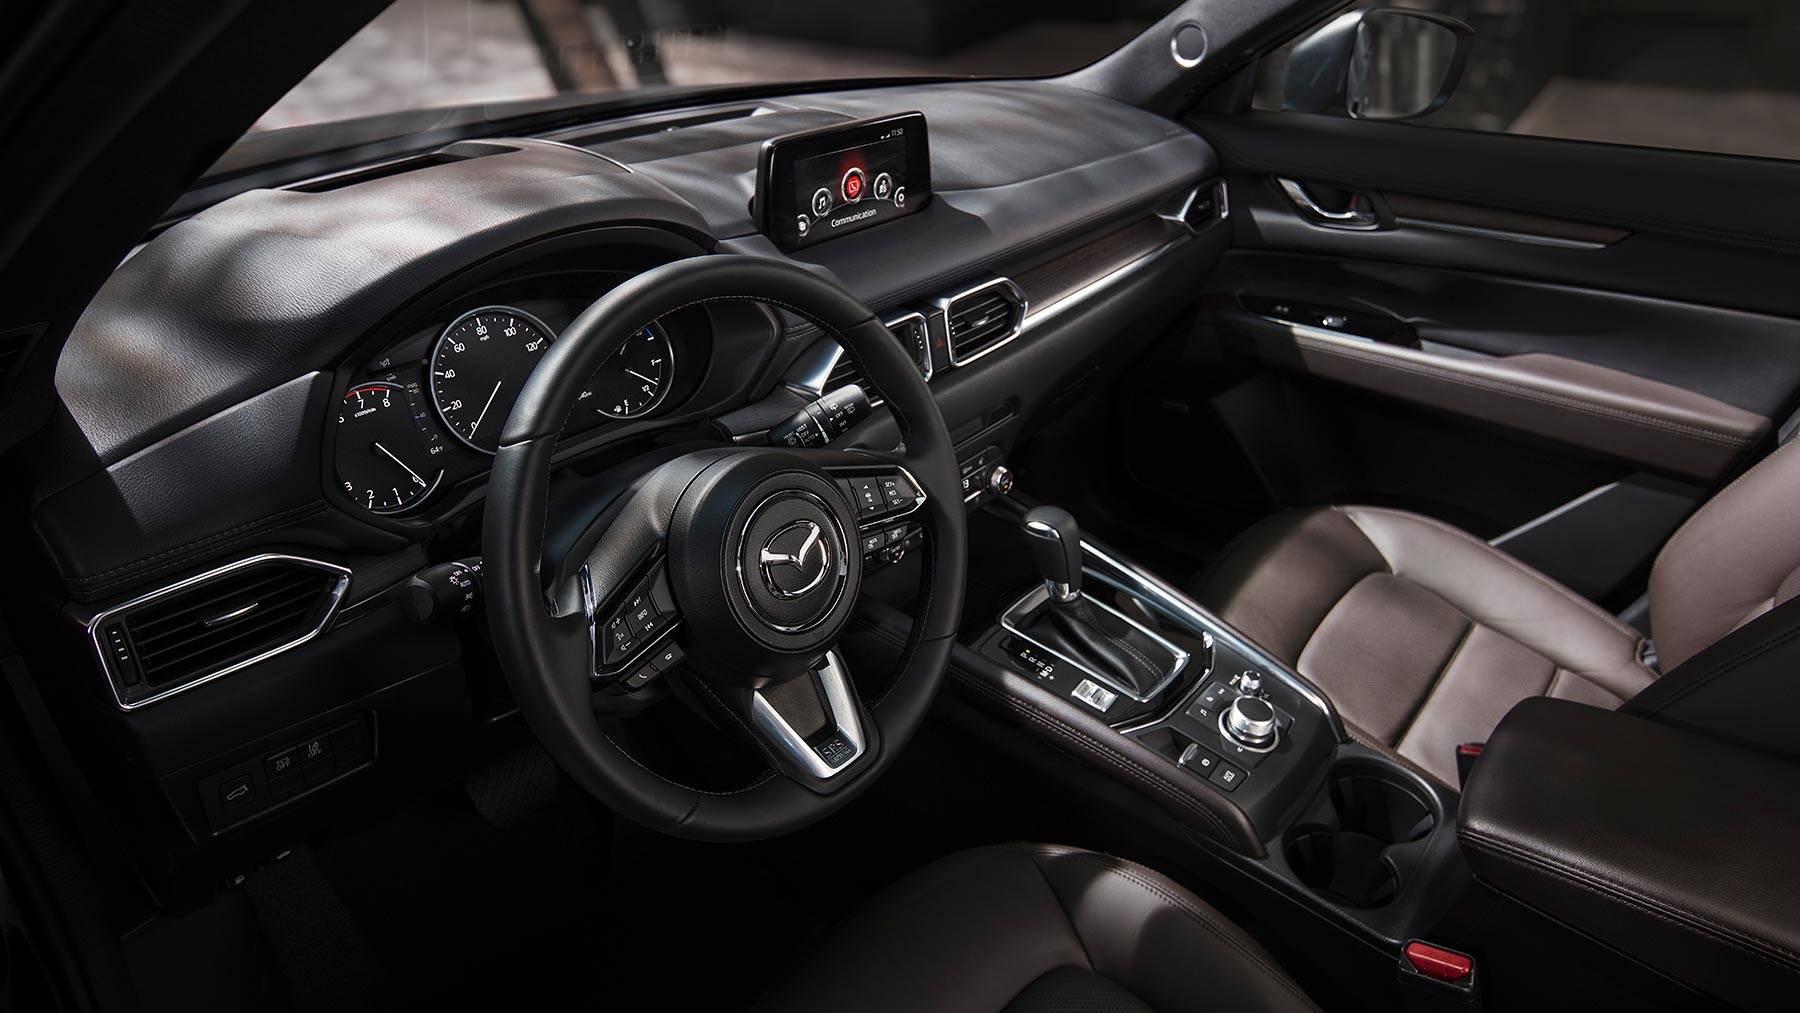 2019 Mazda CX-5 for Sale near Phoenix, AZ - Berge Mazda